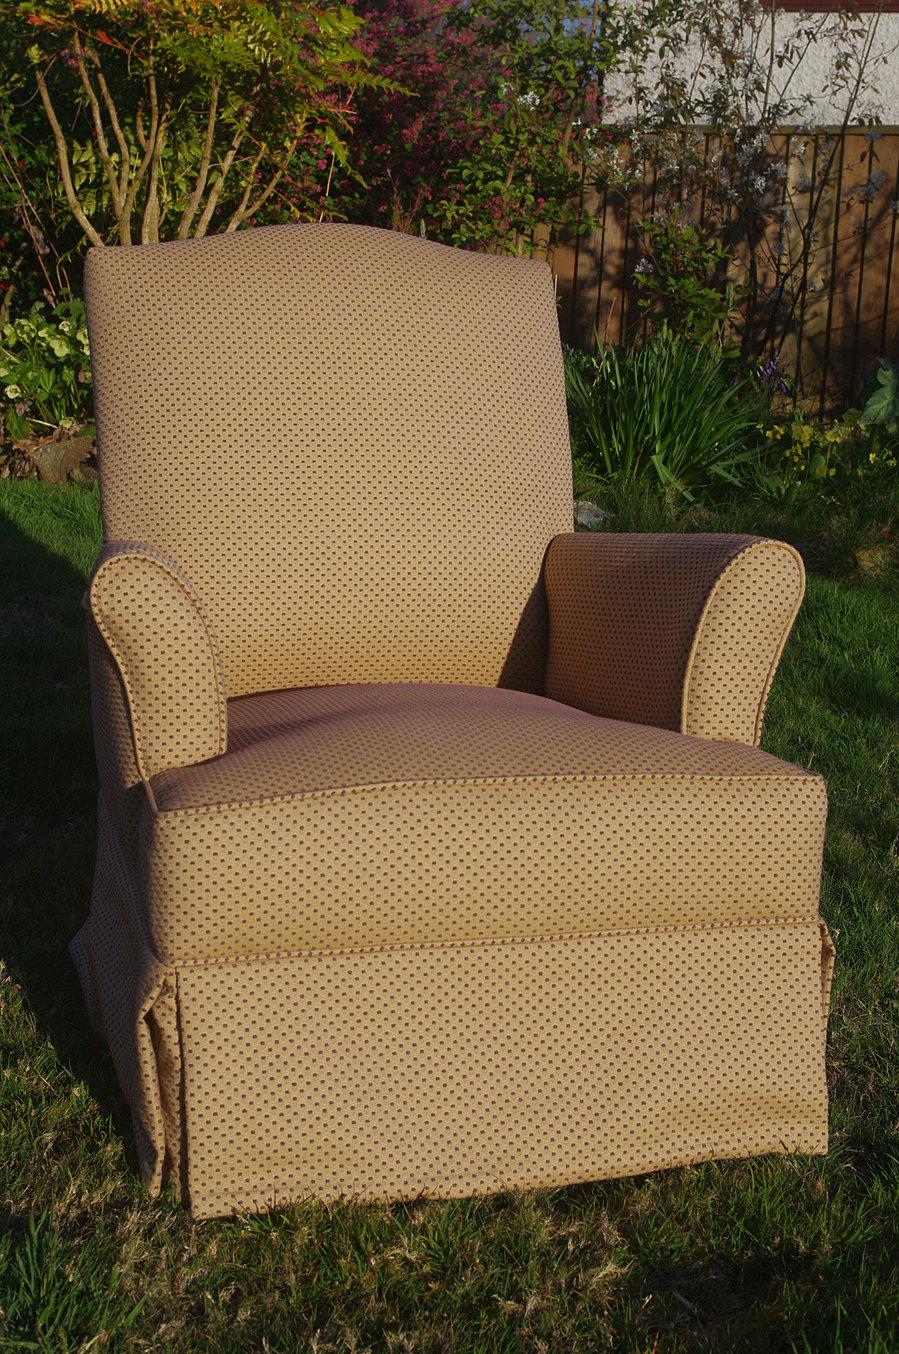 Tavistock Bedroom Furniture Dartmoor Chairs Upholstery Services Tavistock Devon